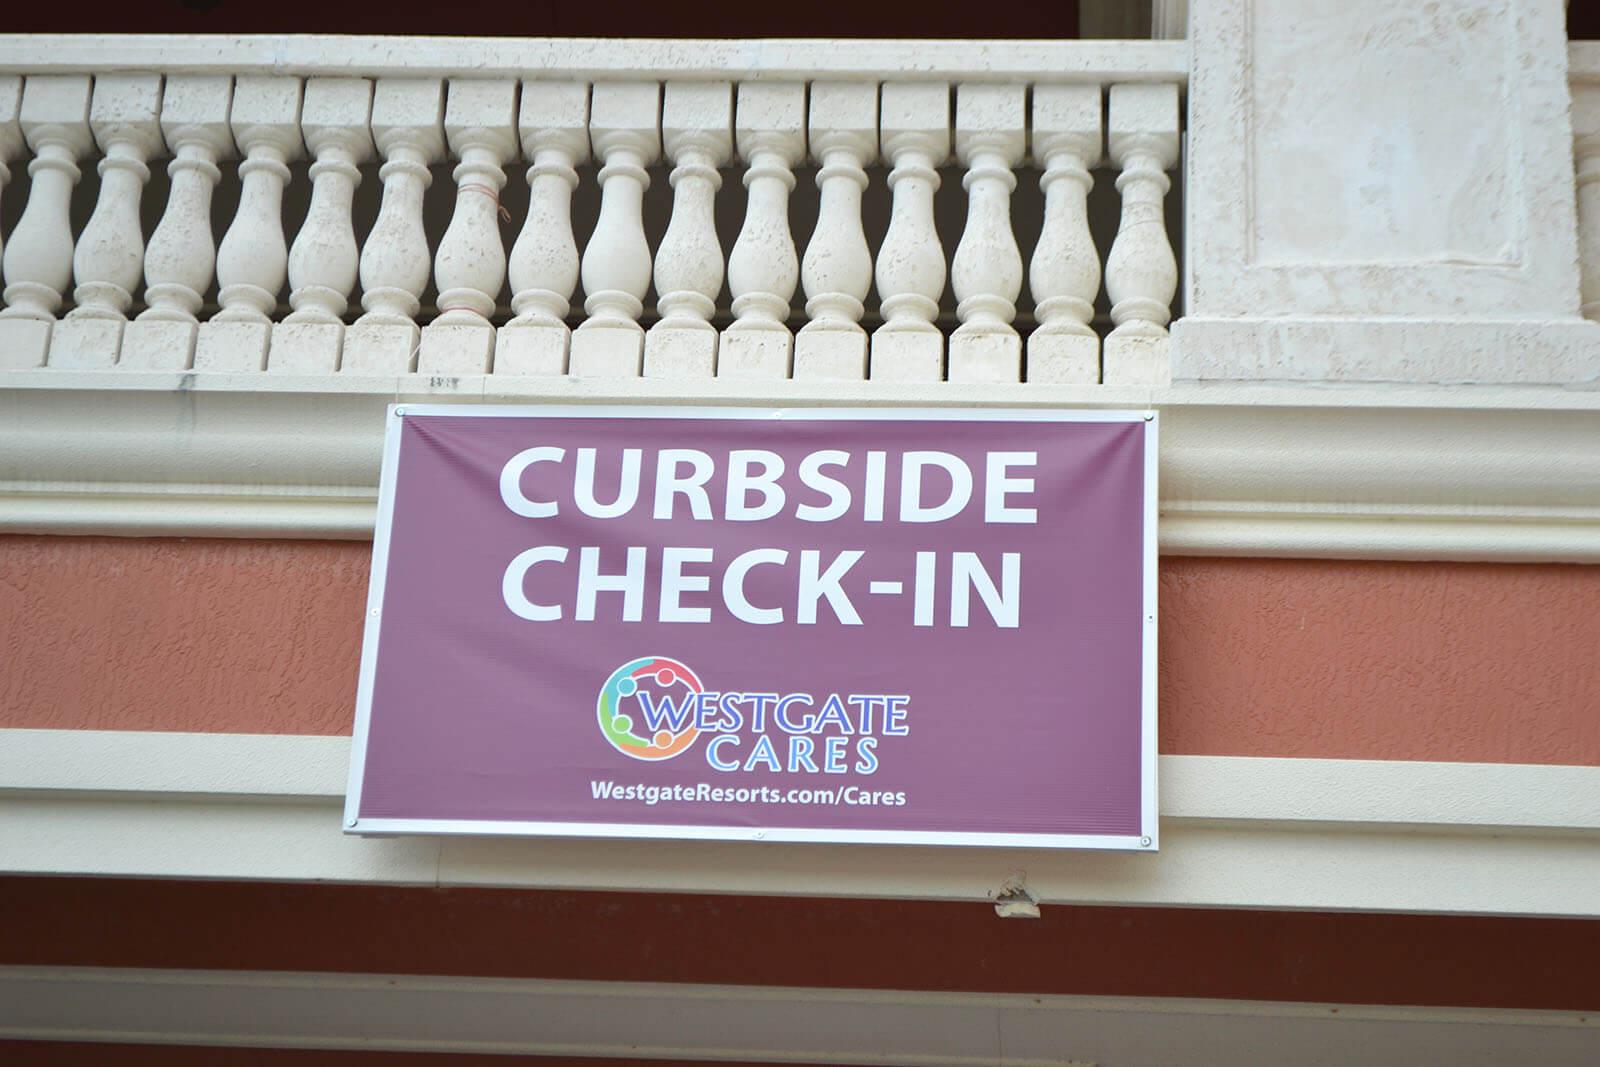 Curbside Checkin At Westgate Town Center Resort in Orlando, FL